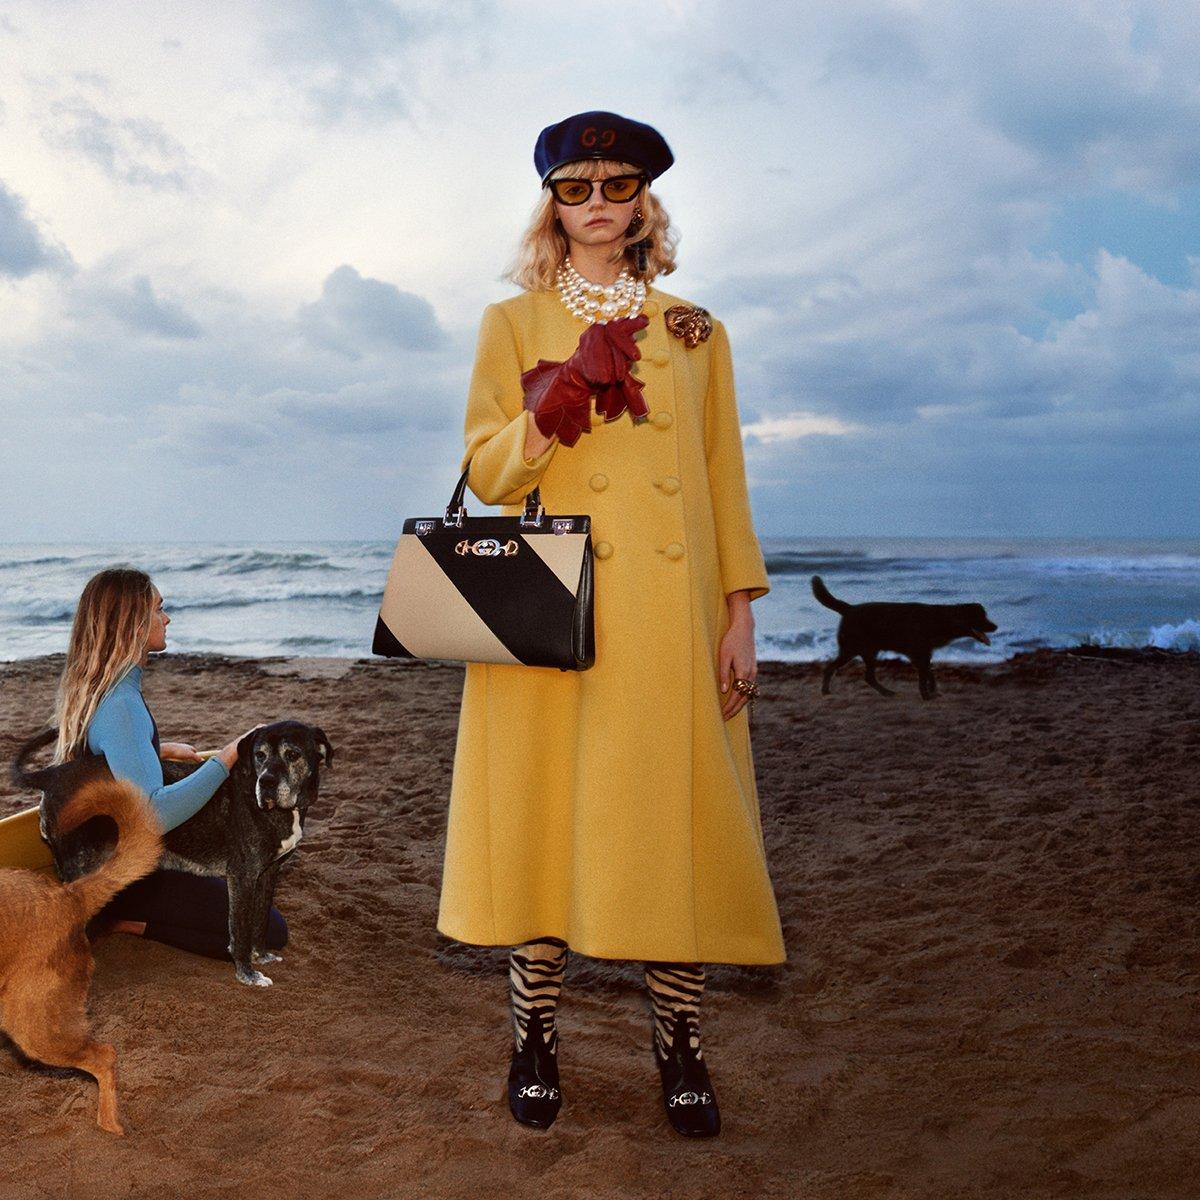 7e52247860de Gucci UK: The Striped Gucci Zumi Bag | Milled